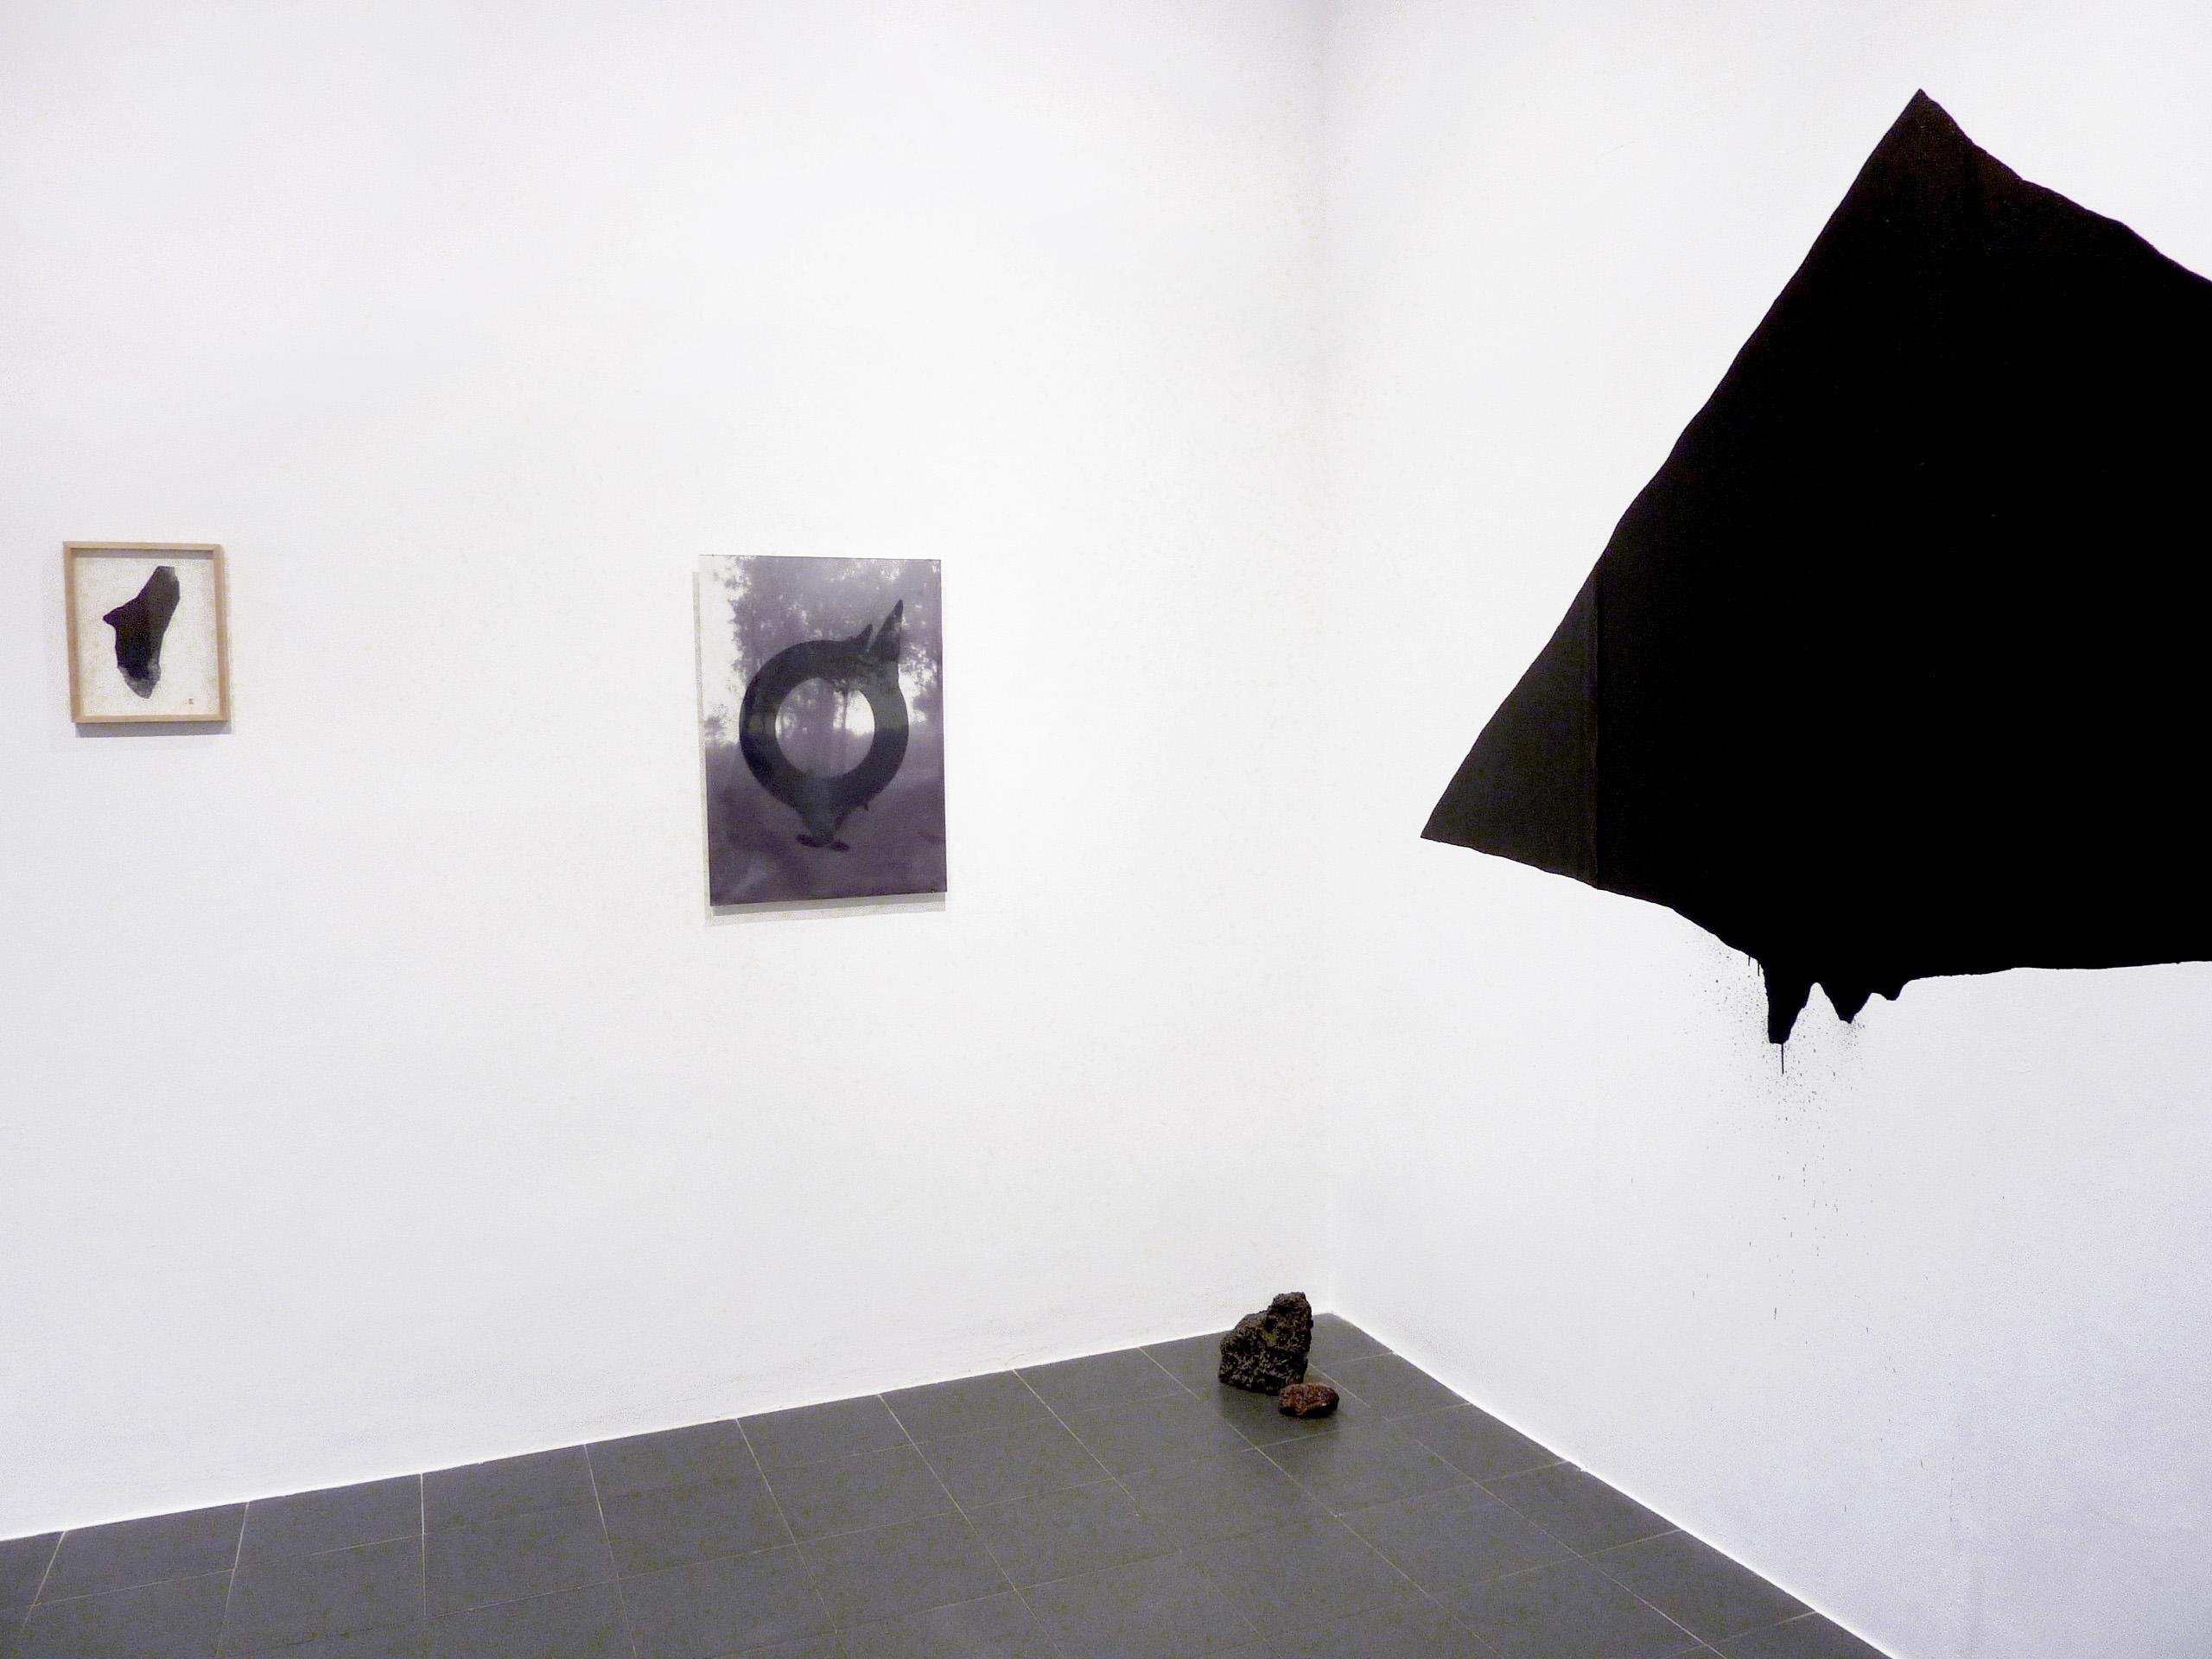 108-lava-at-van-der-gallery-recap-05